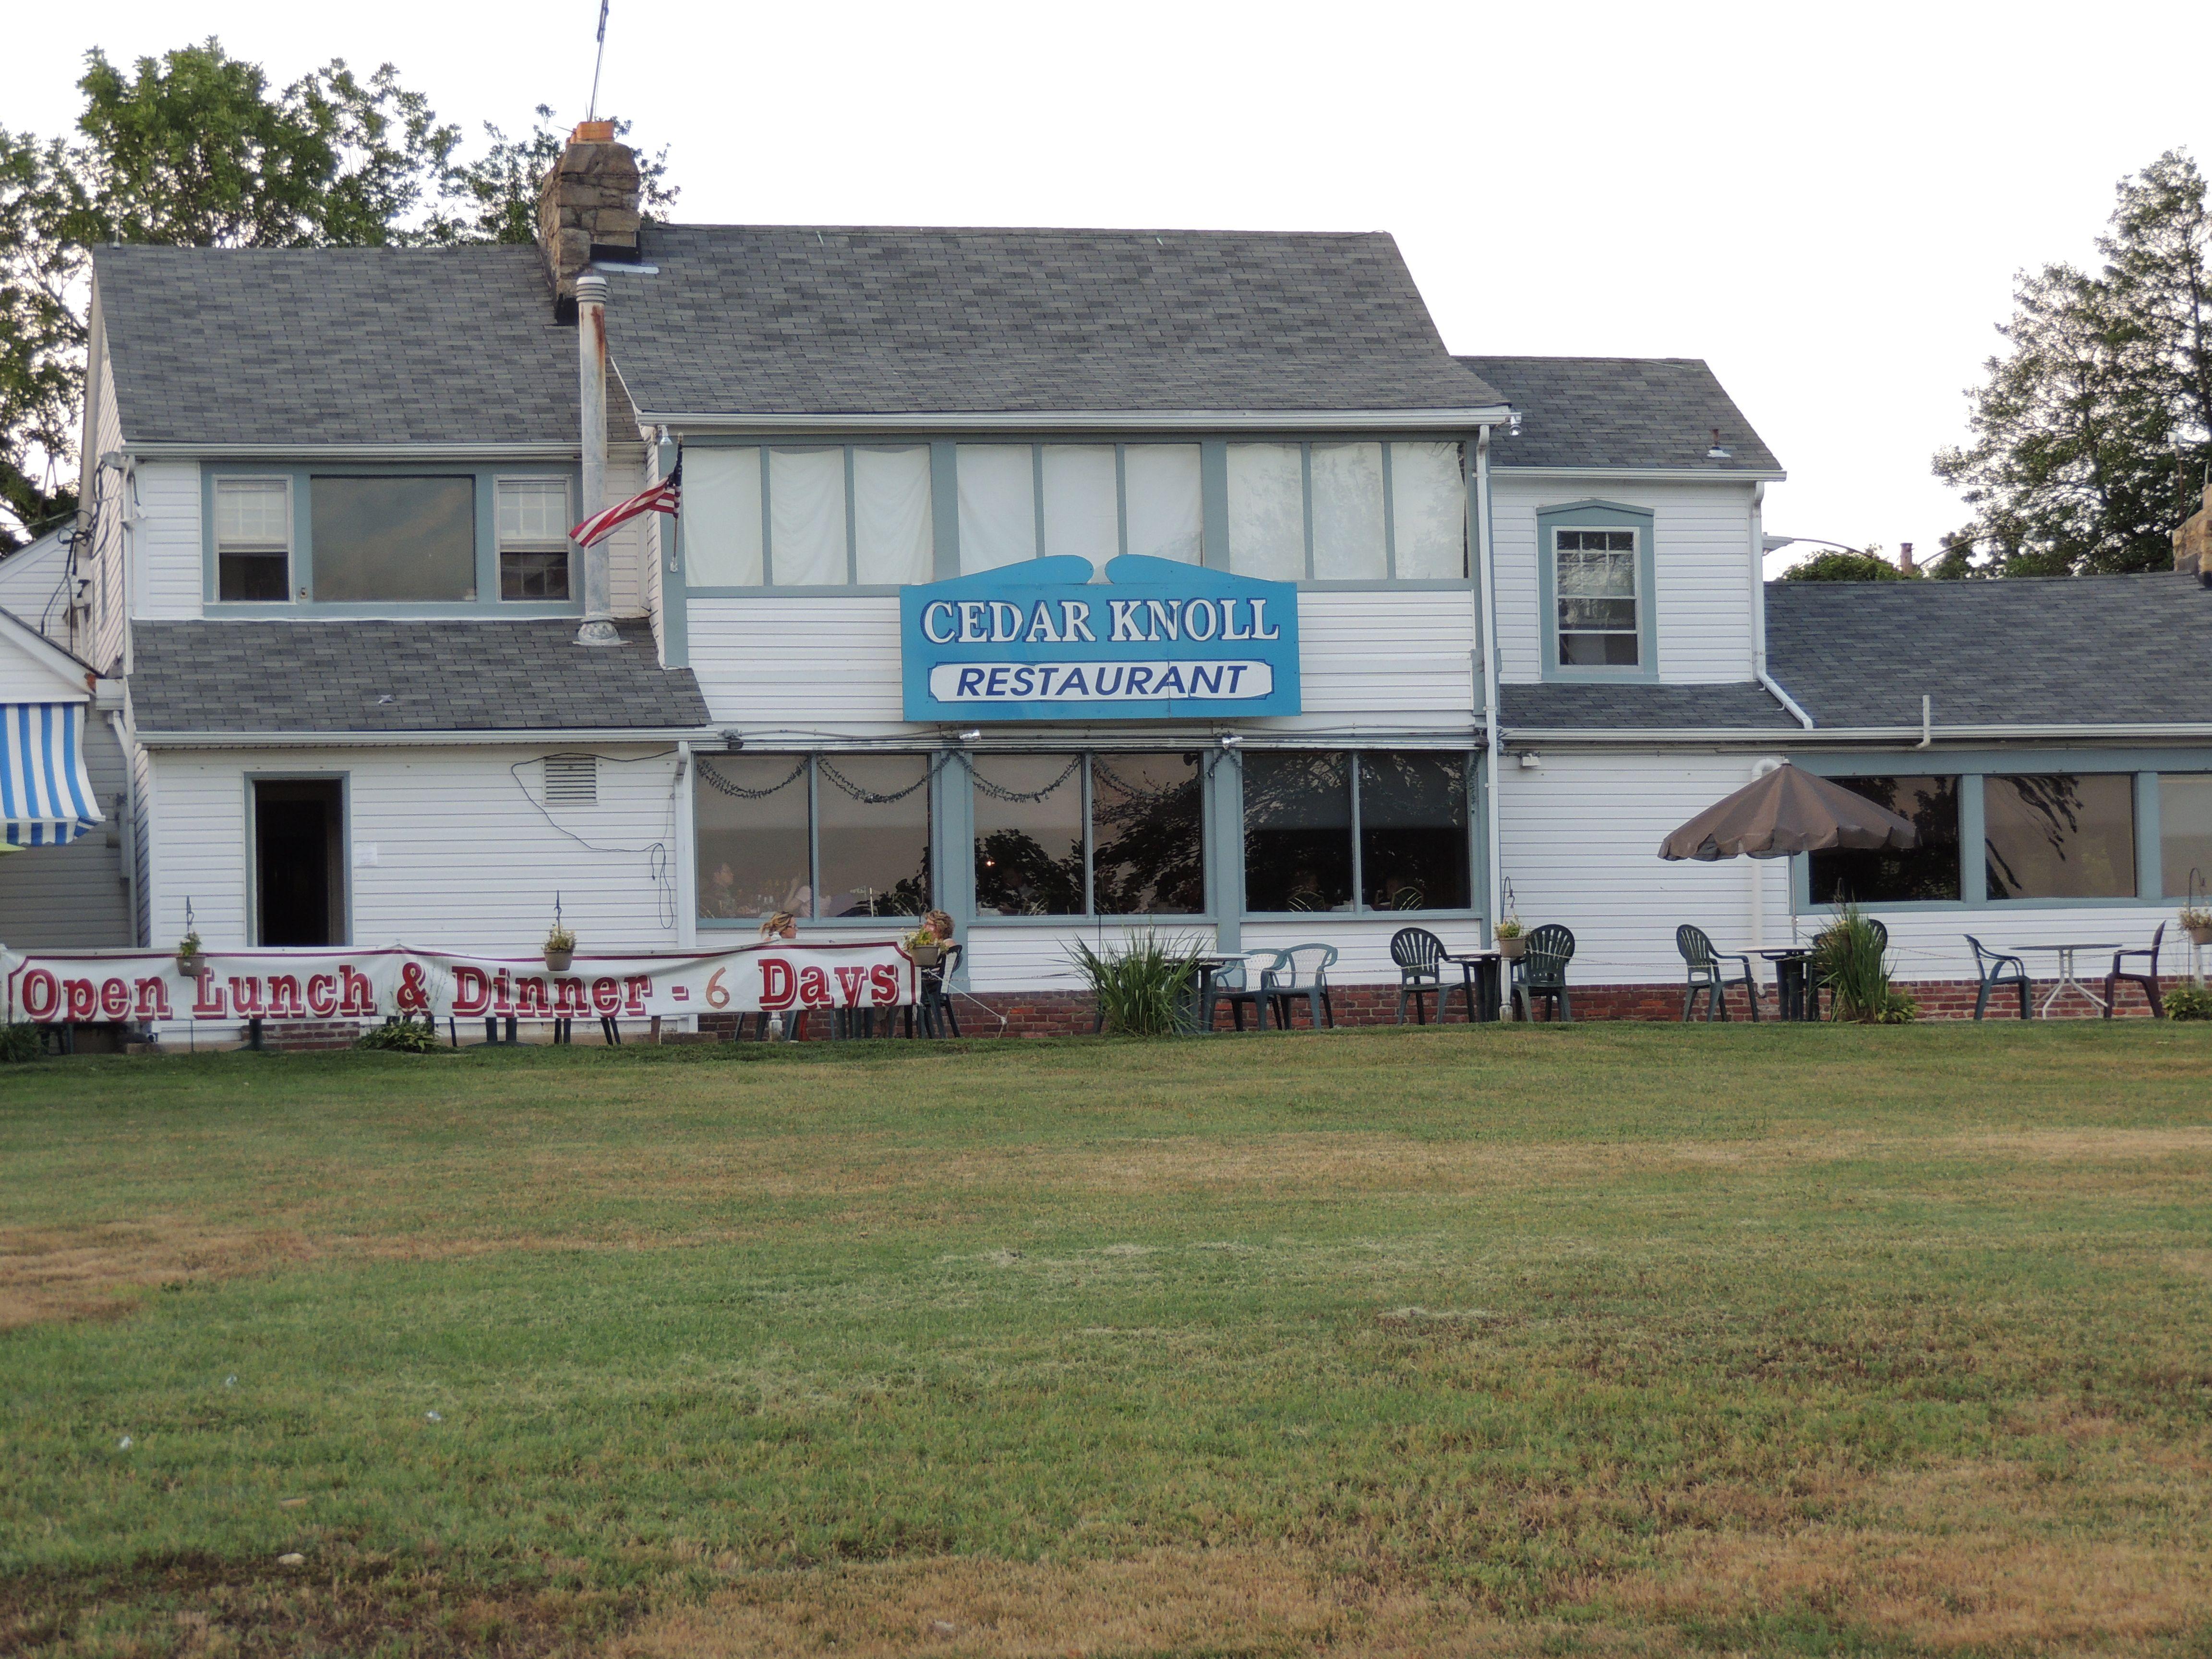 Cedar Knoll Restaurant Is Located On The George Washington